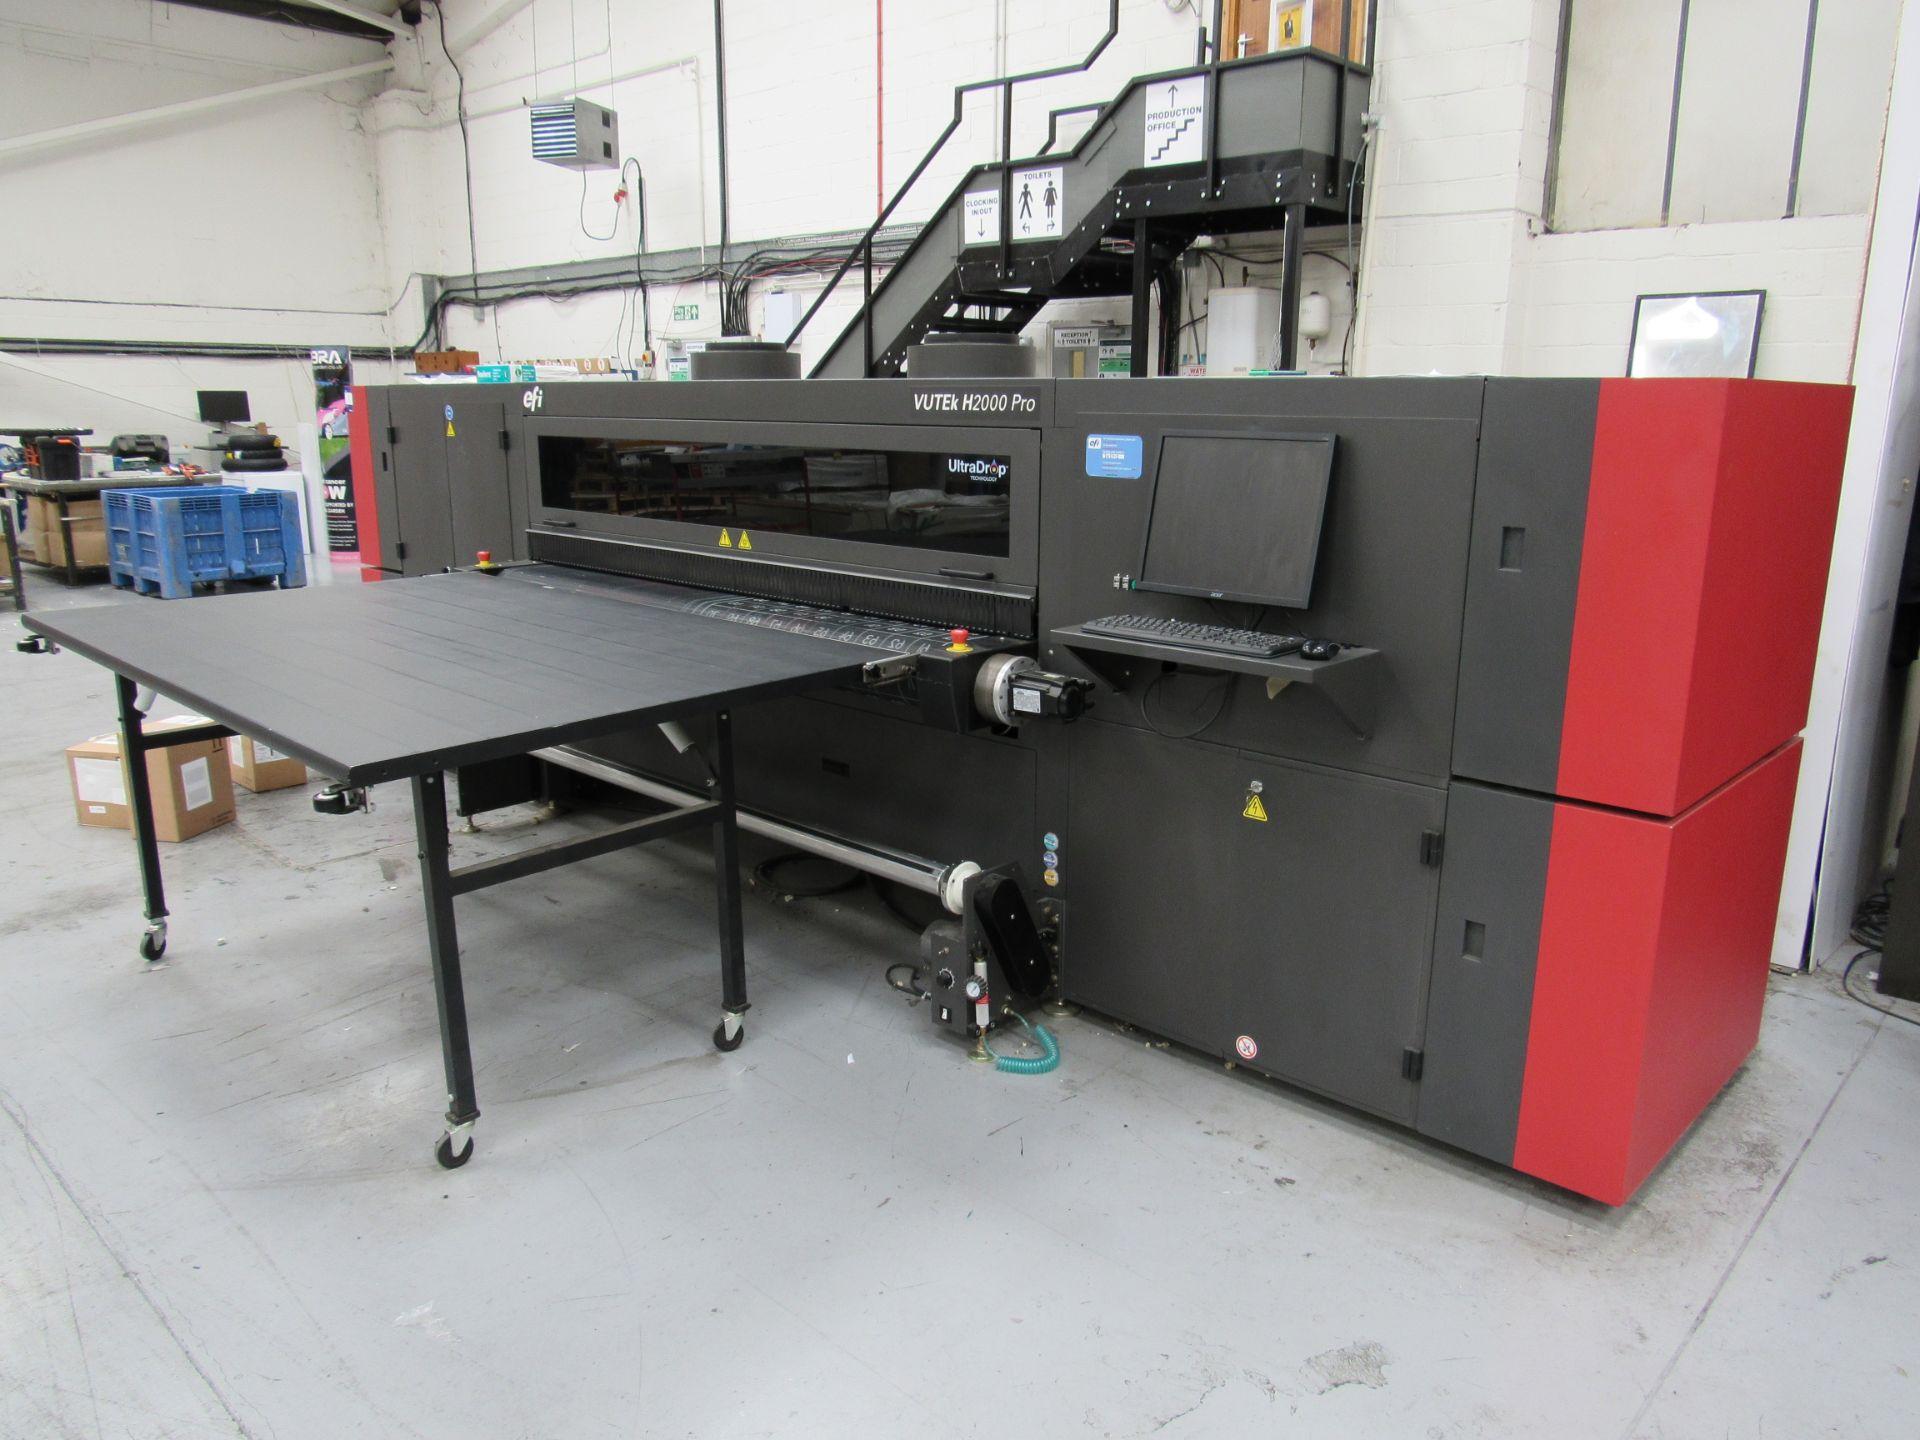 EFI VUTEk H2000 Pro - UltraDrop Technology UV 2m Hybrid Printer, Serial Number 262013, Dec 2014, - Image 6 of 16